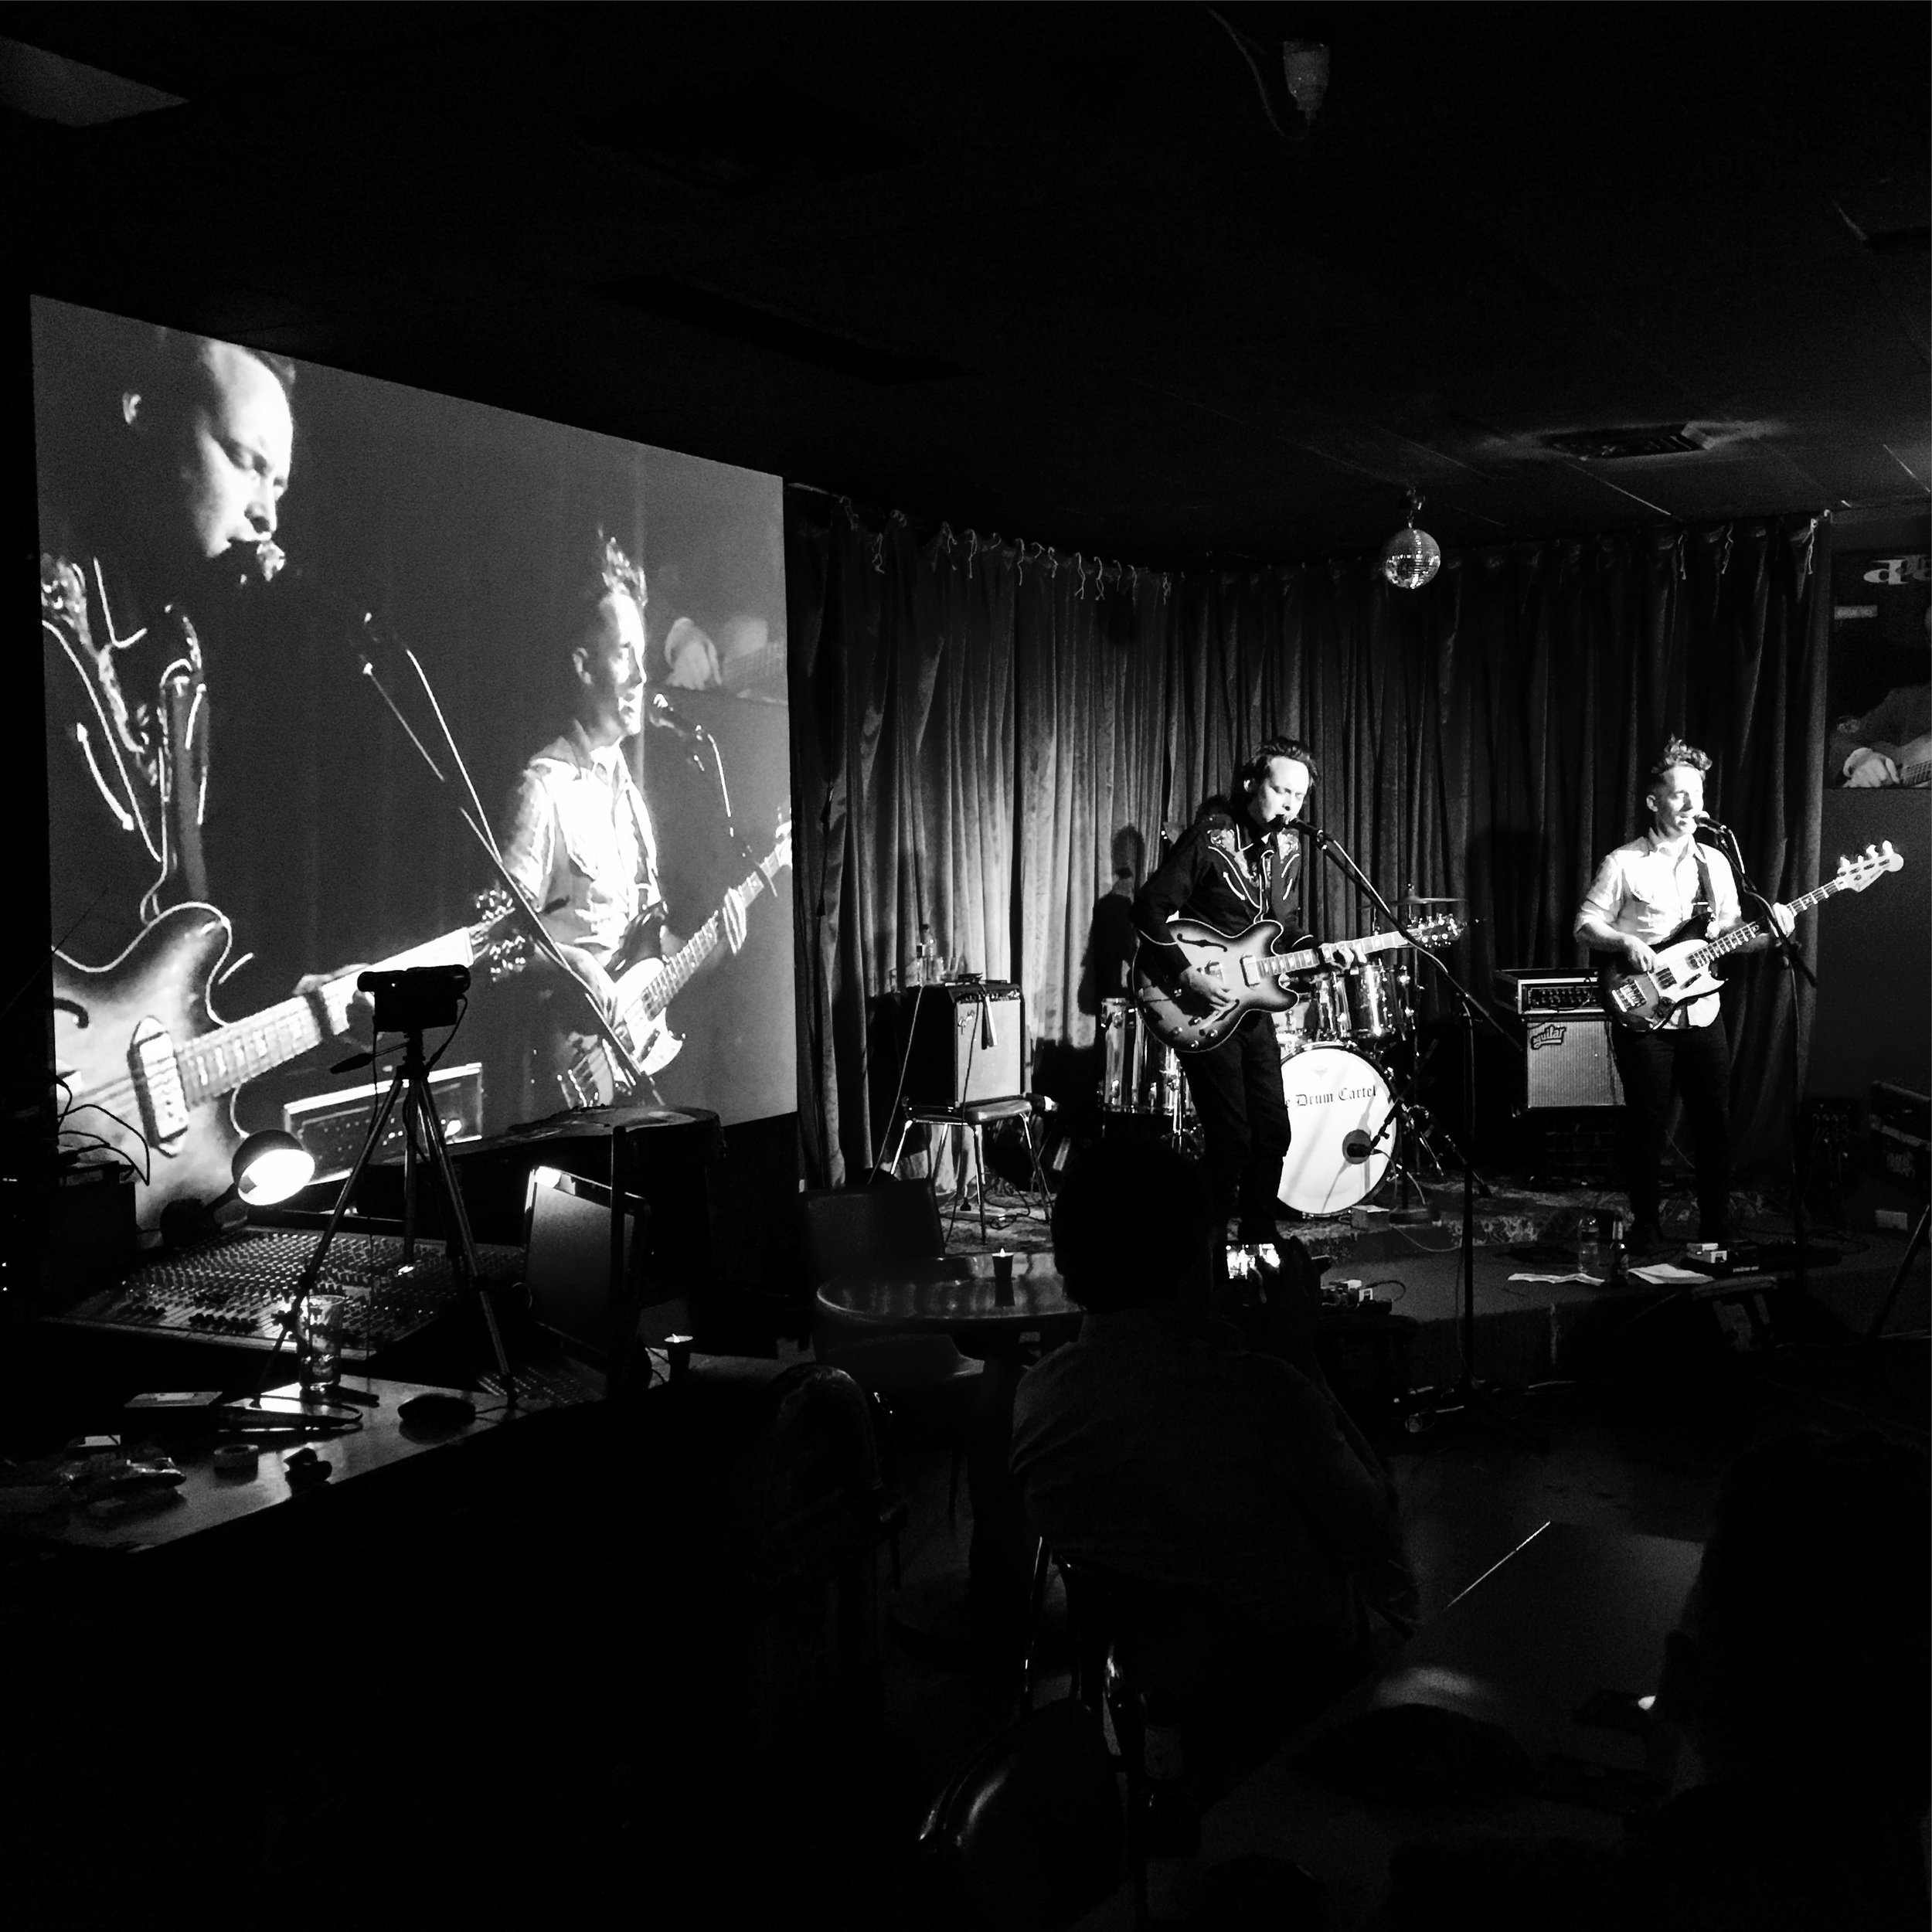 Photo by Pete Kilroy, taken at Django Bar, Sydney, March 17th 2017.